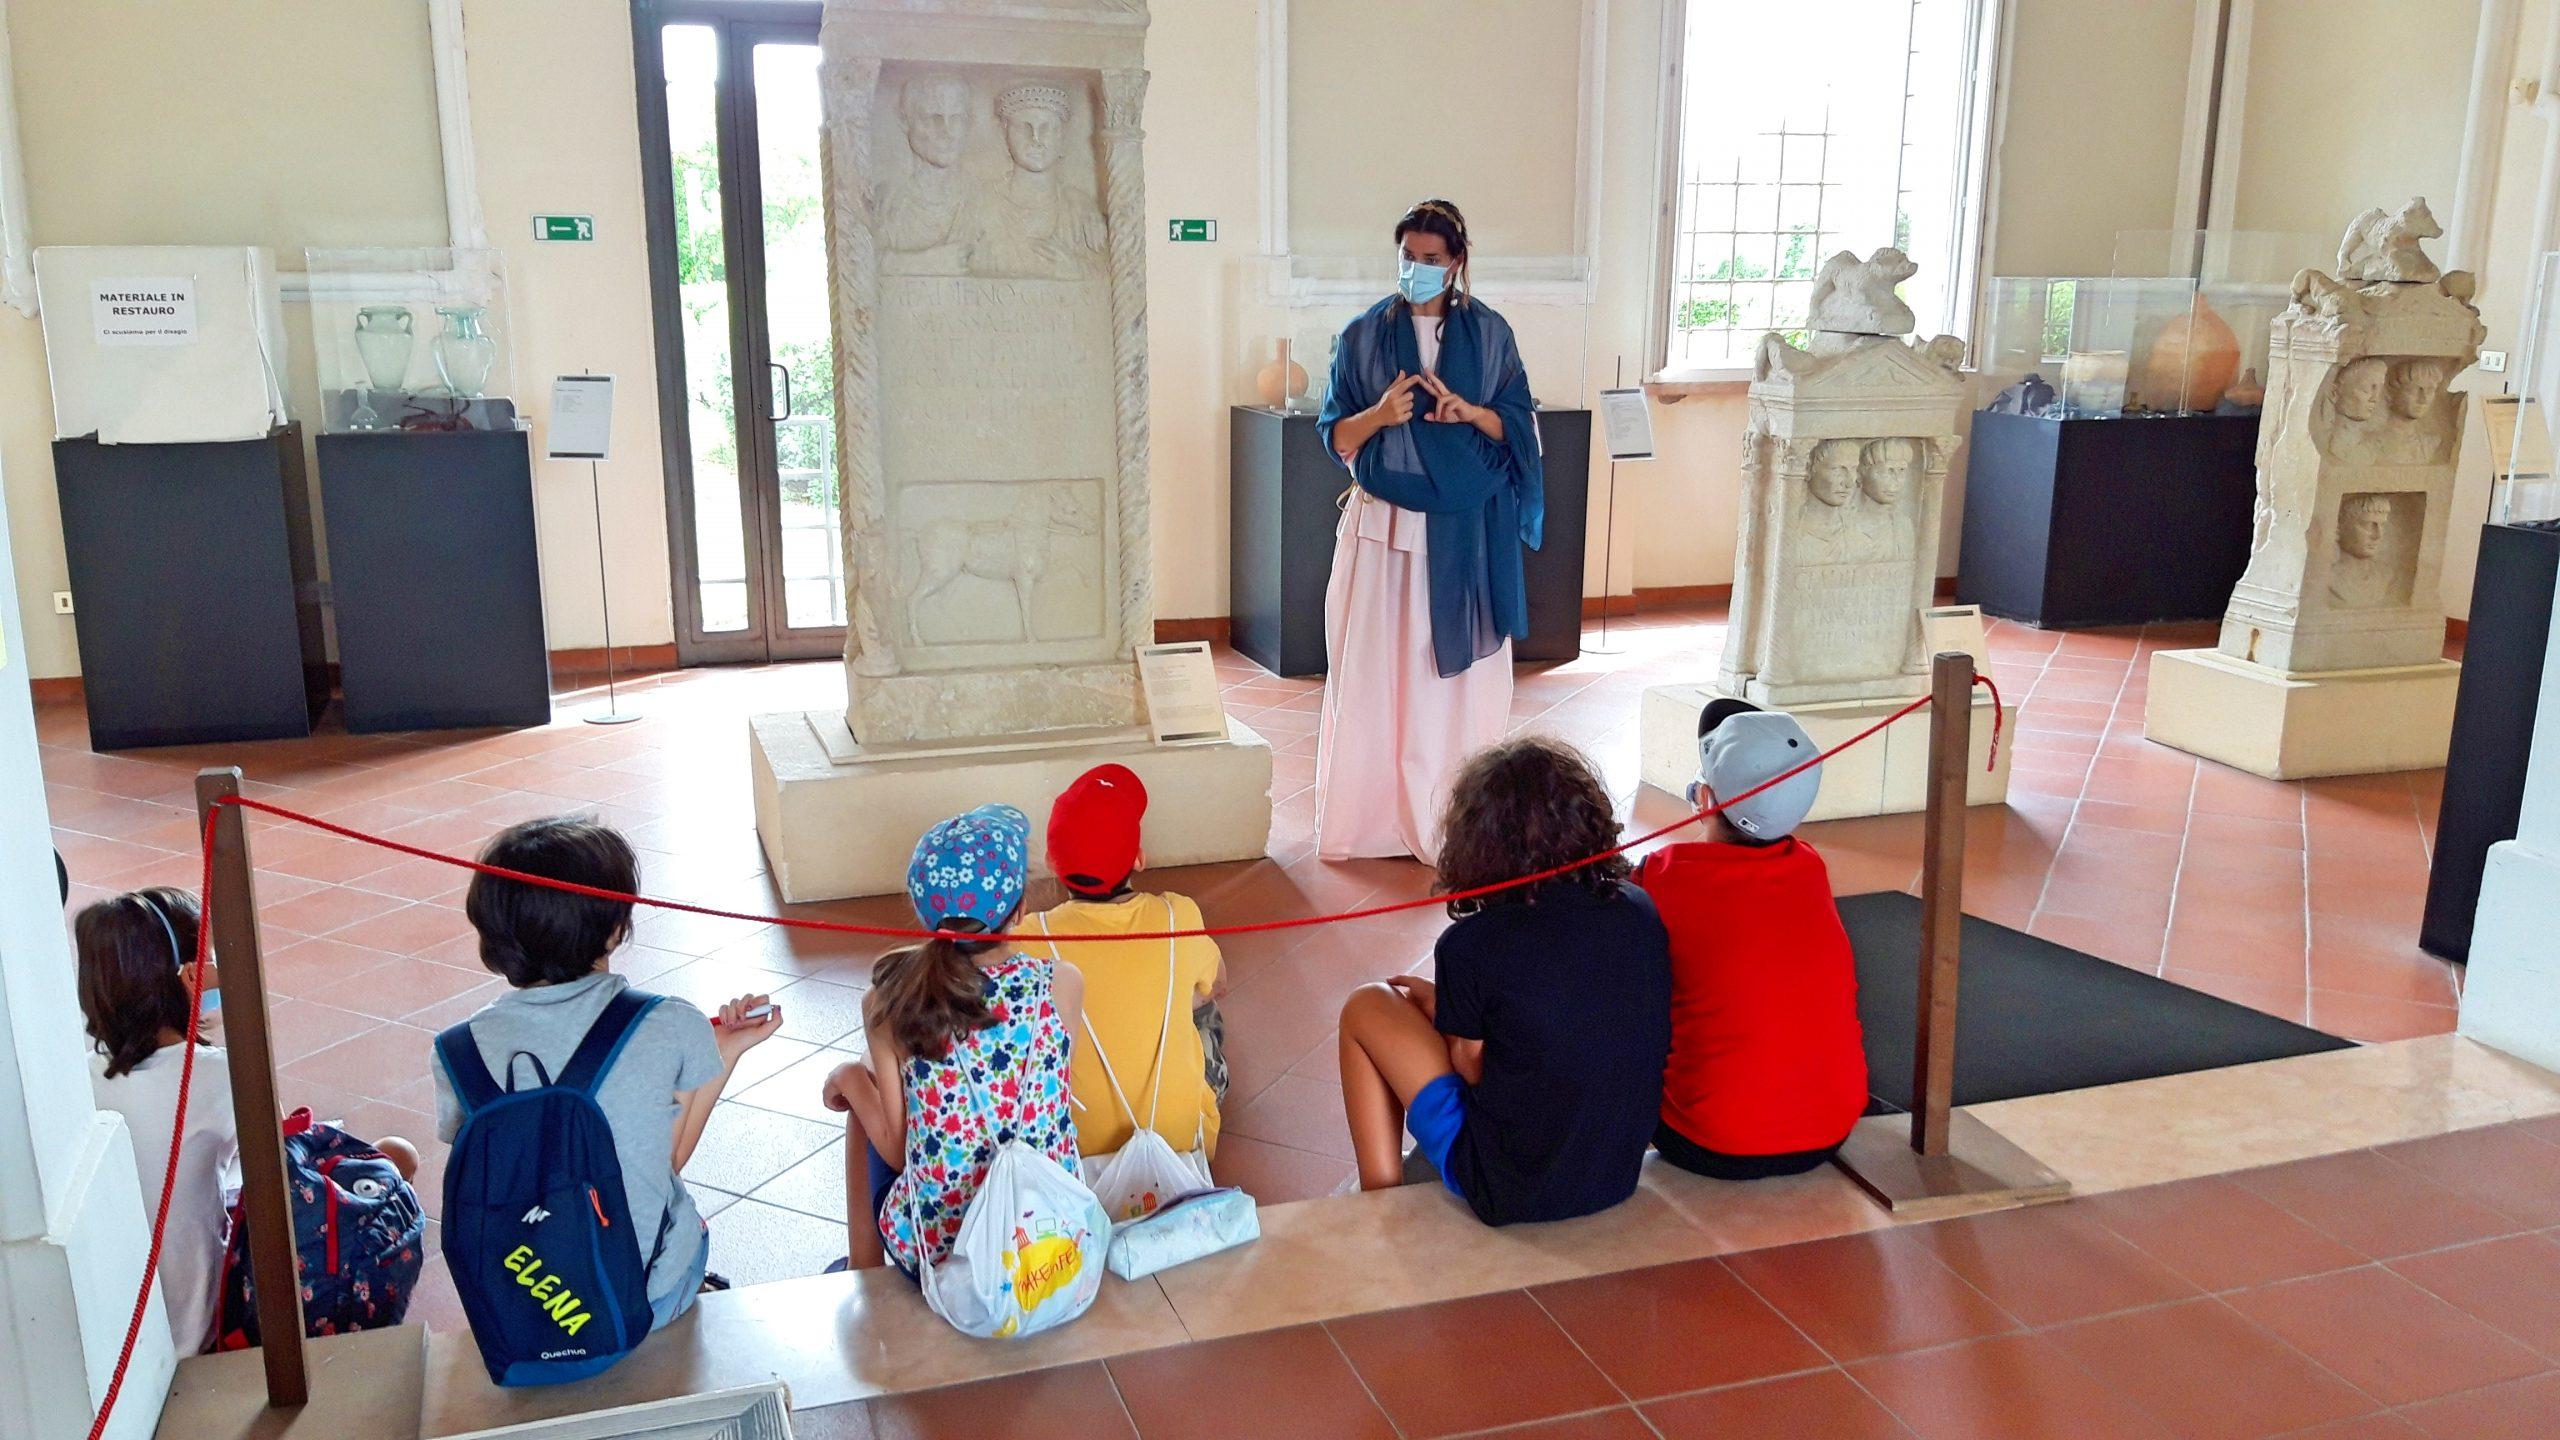 6. A casa di un'antica famiglia romana